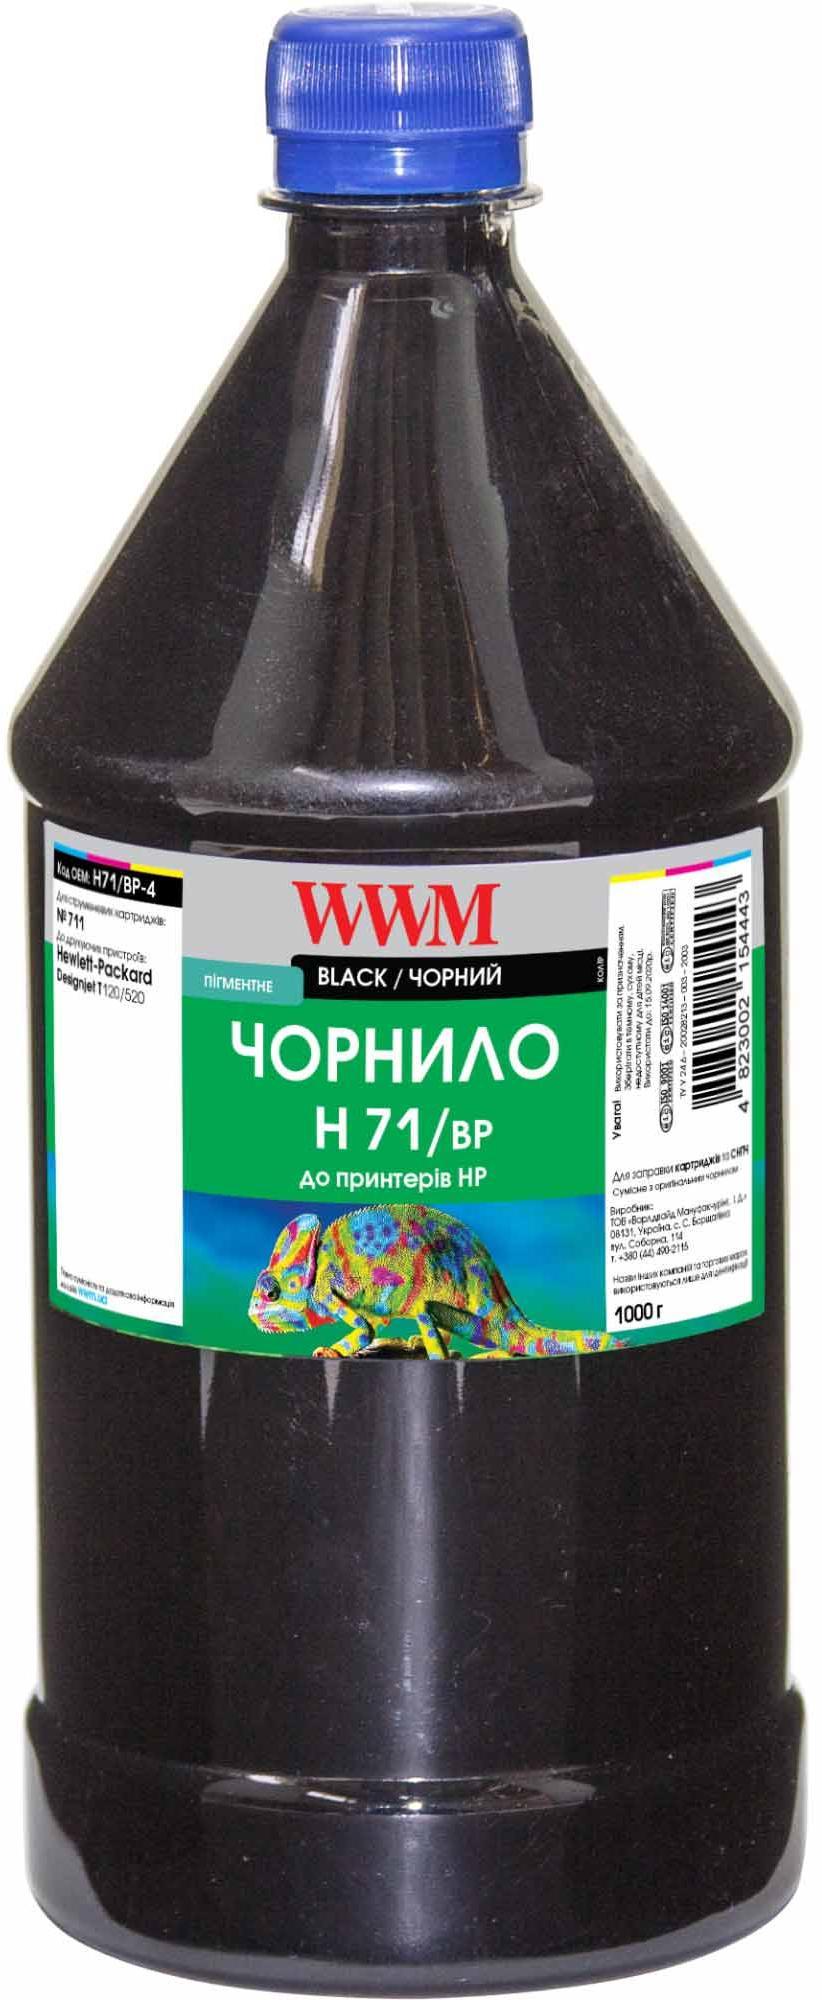 Купить Чорнило WWM for HP №711 1000g Black (H71/BP-4)